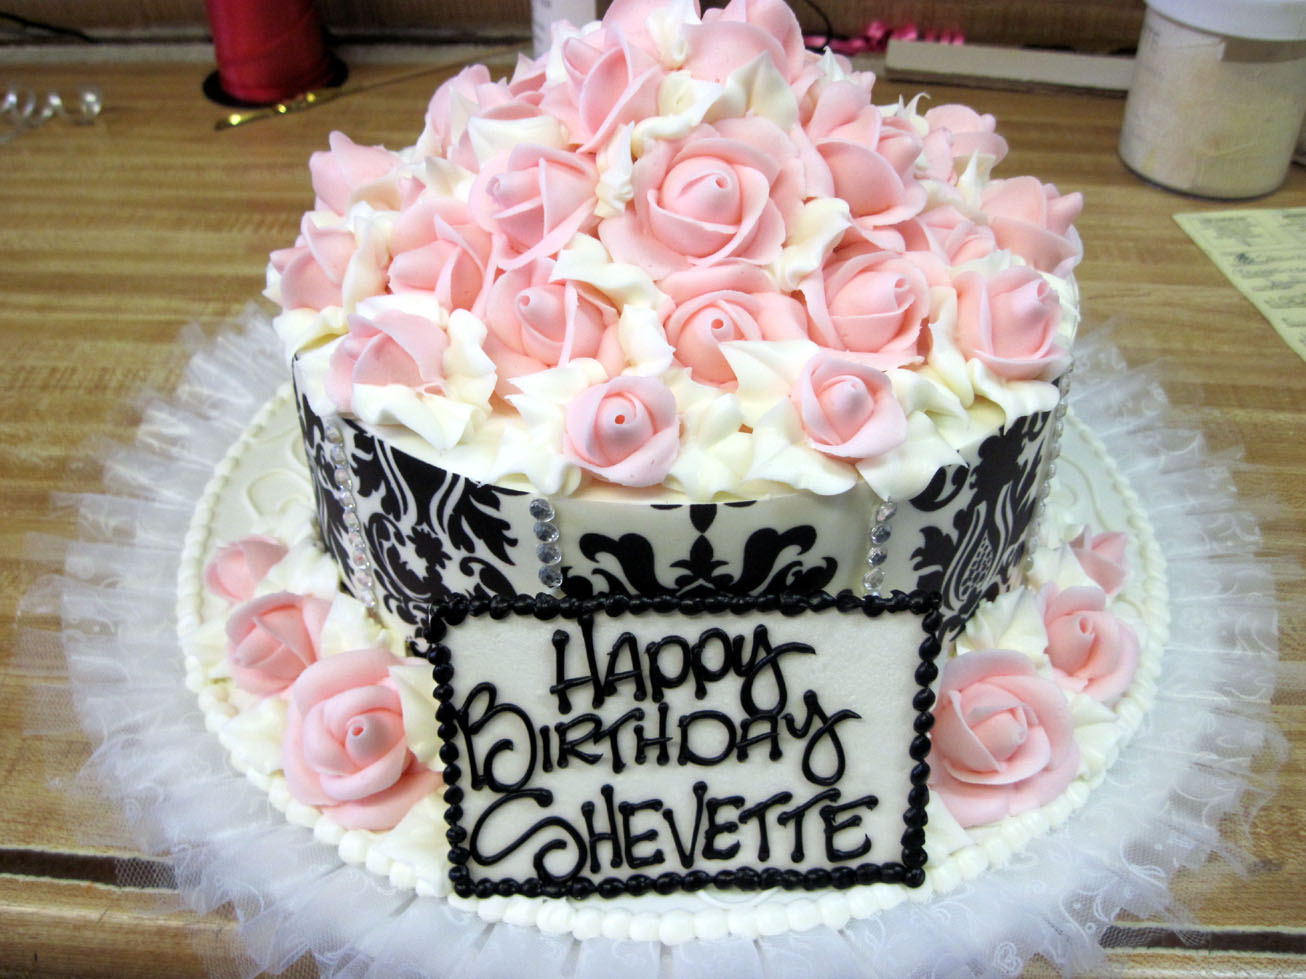 Hansen Cakes Owner